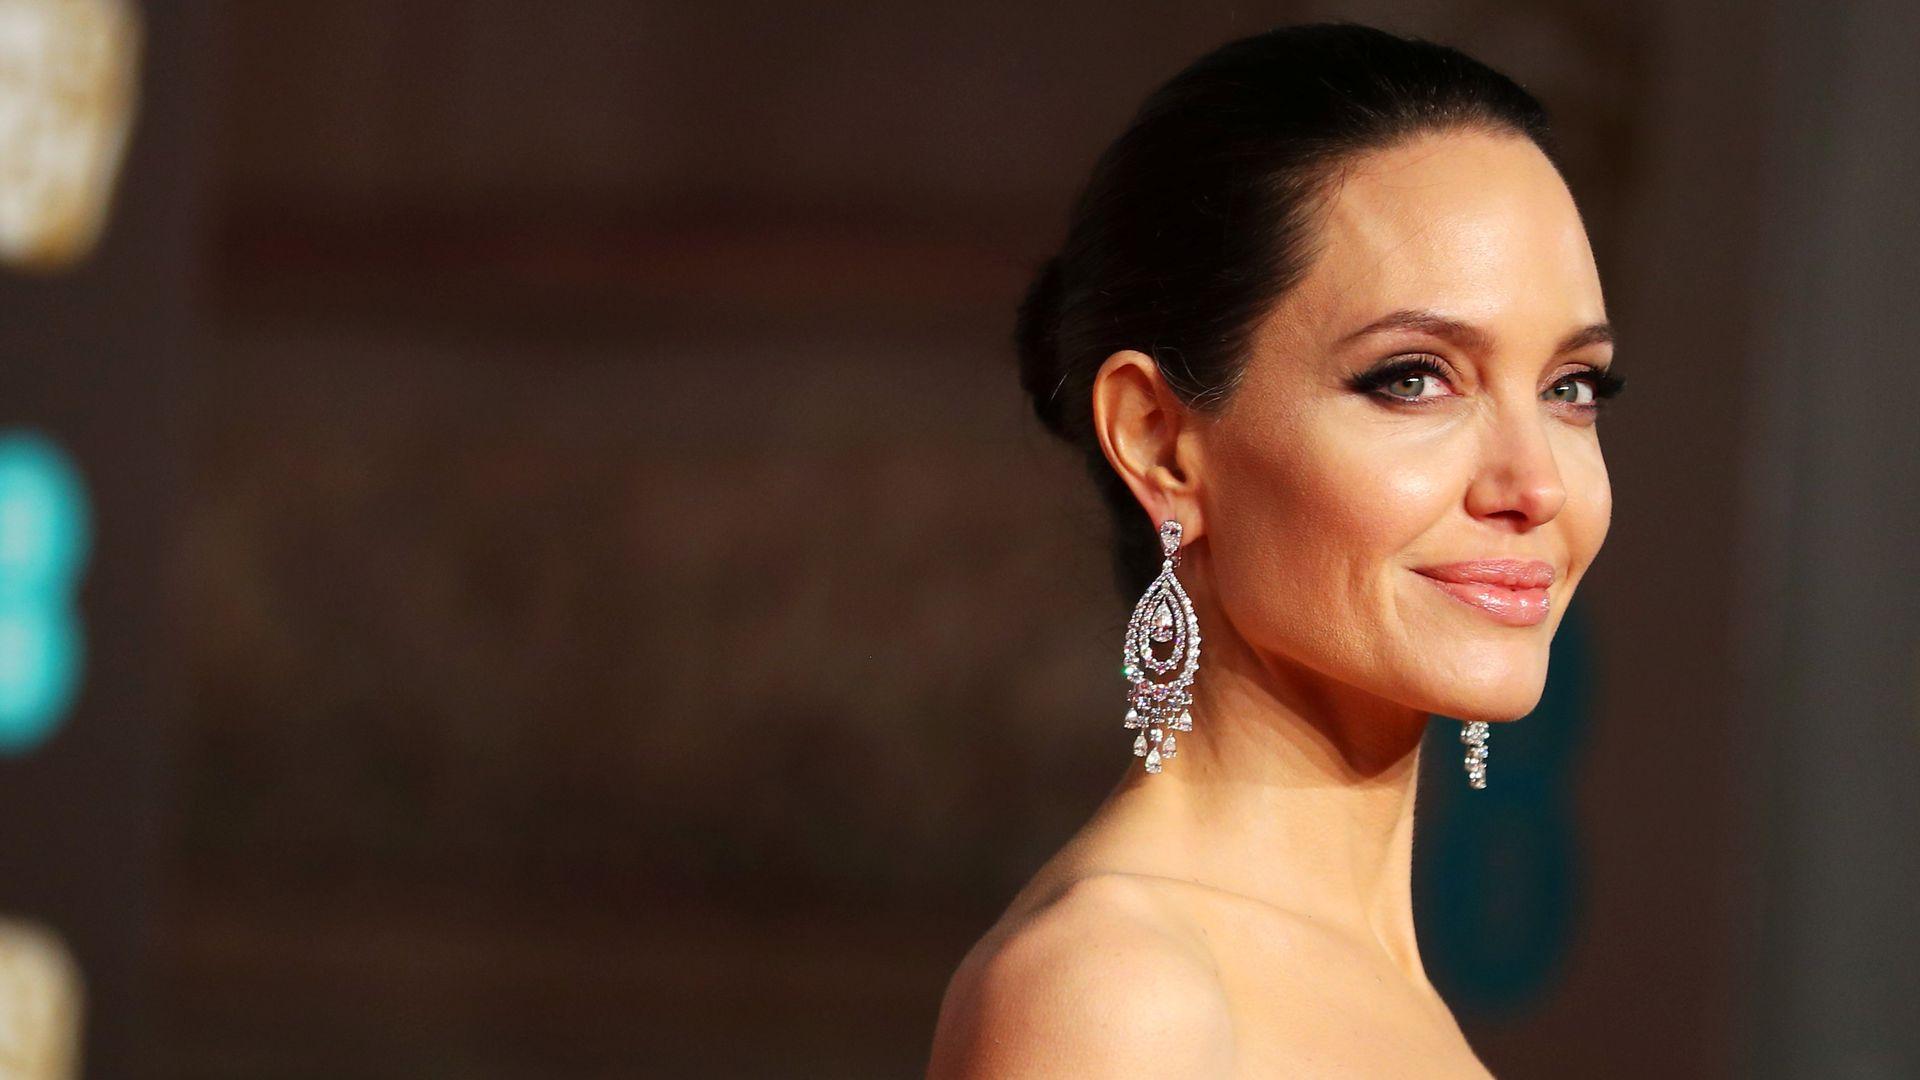 Yönetmen Angelina